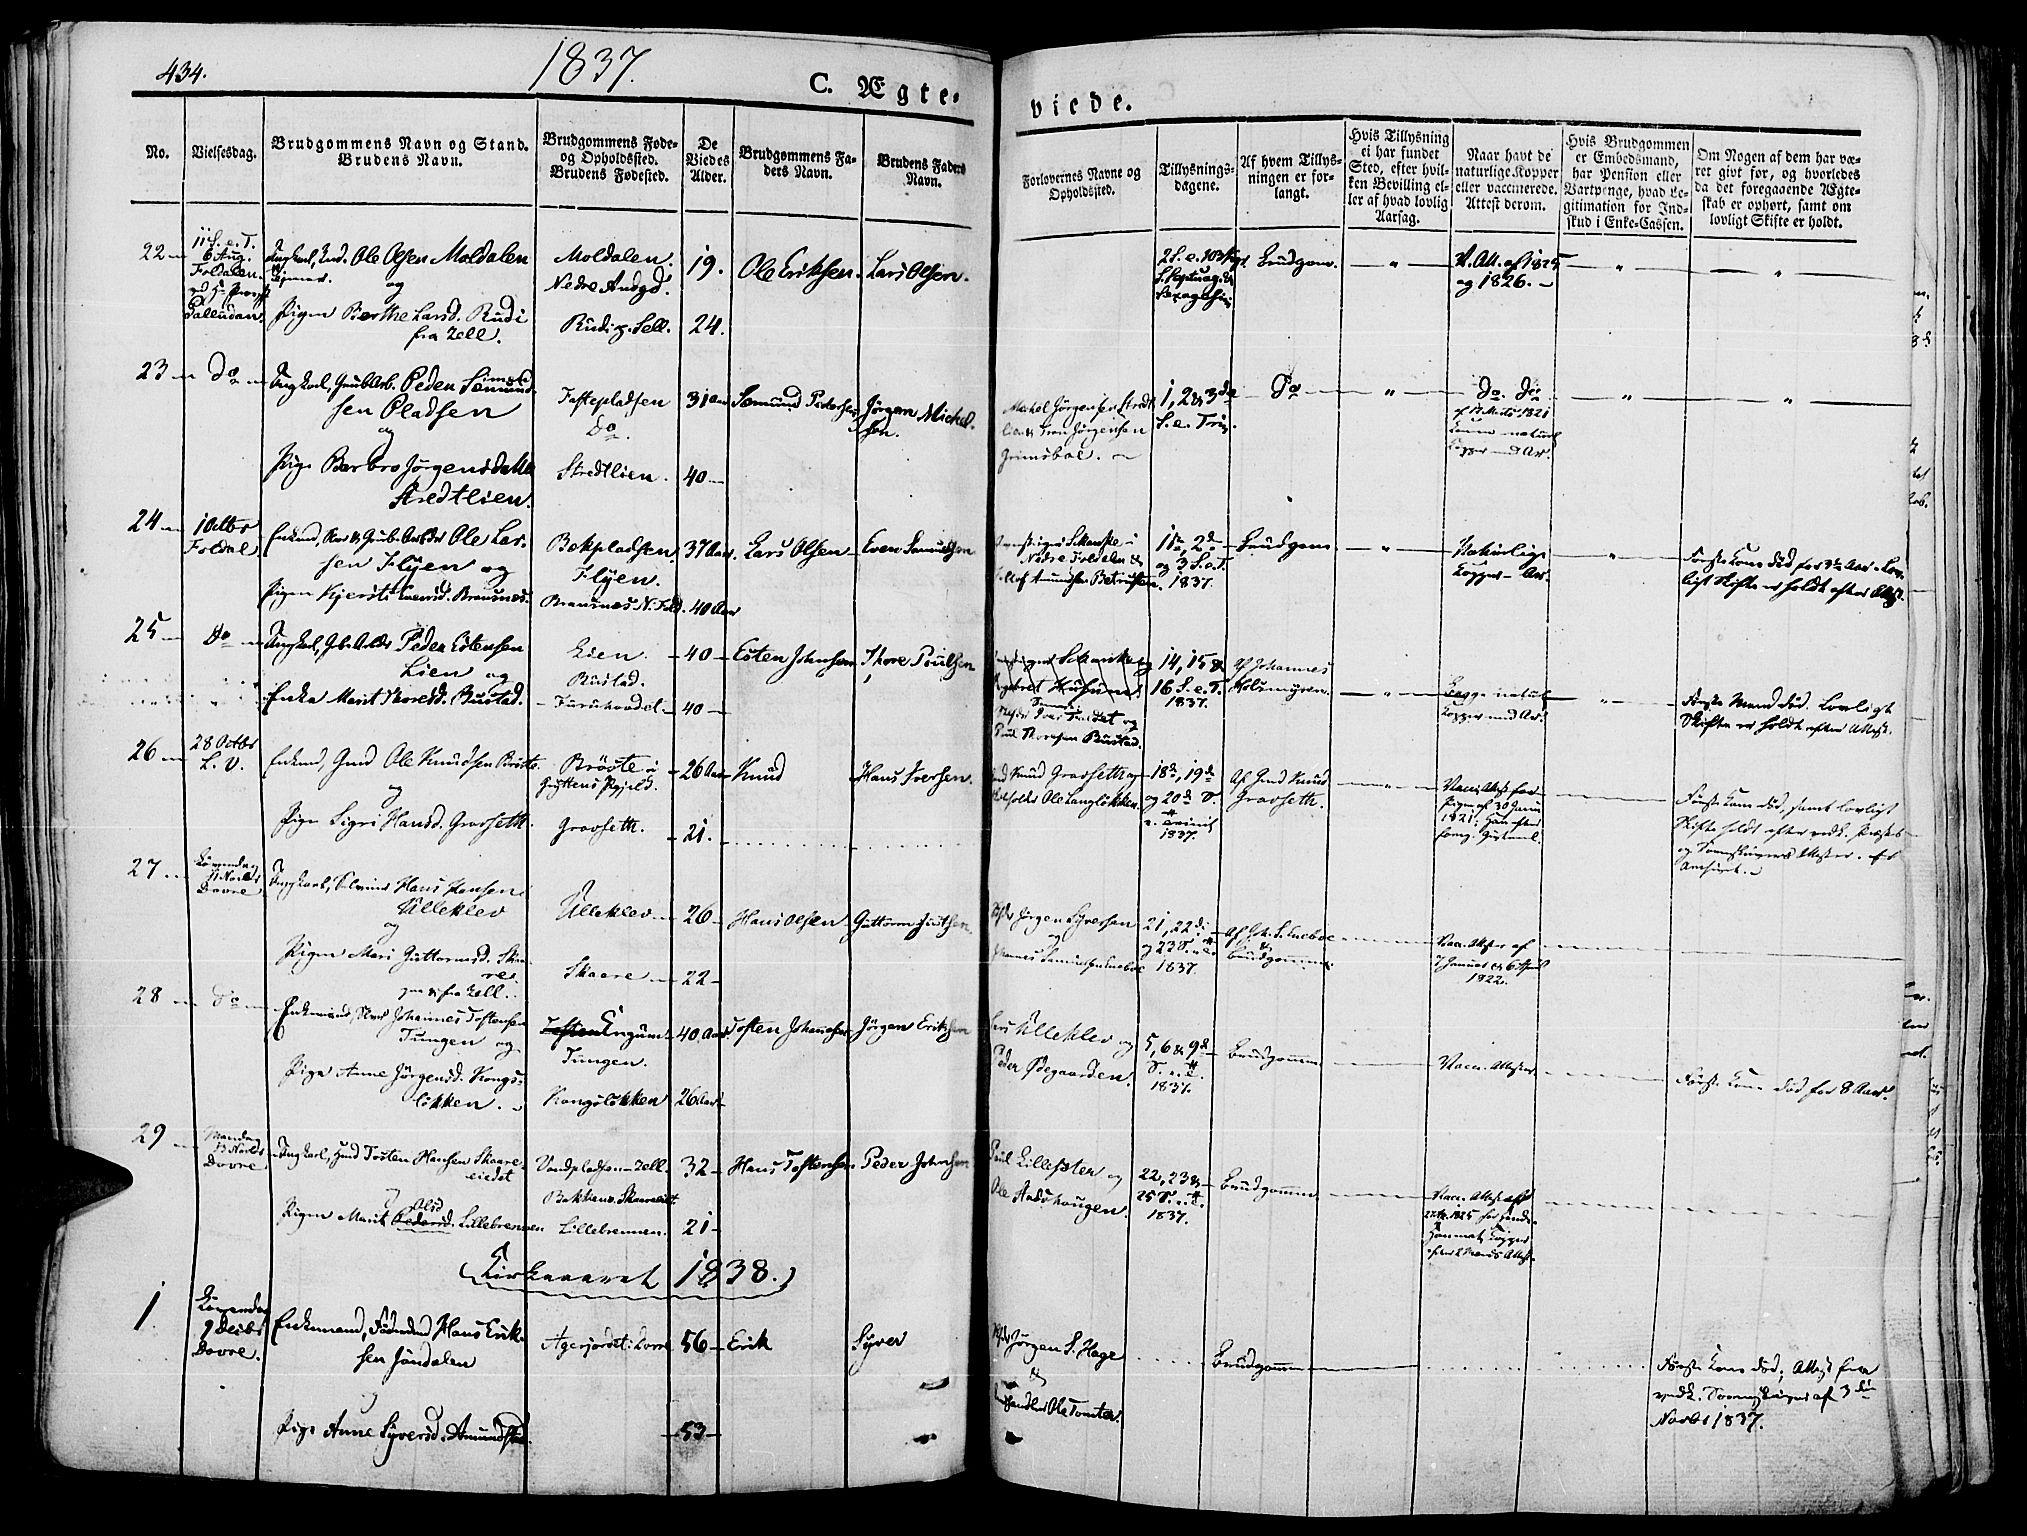 SAH, Lesja prestekontor, Ministerialbok nr. 5, 1830-1842, s. 434